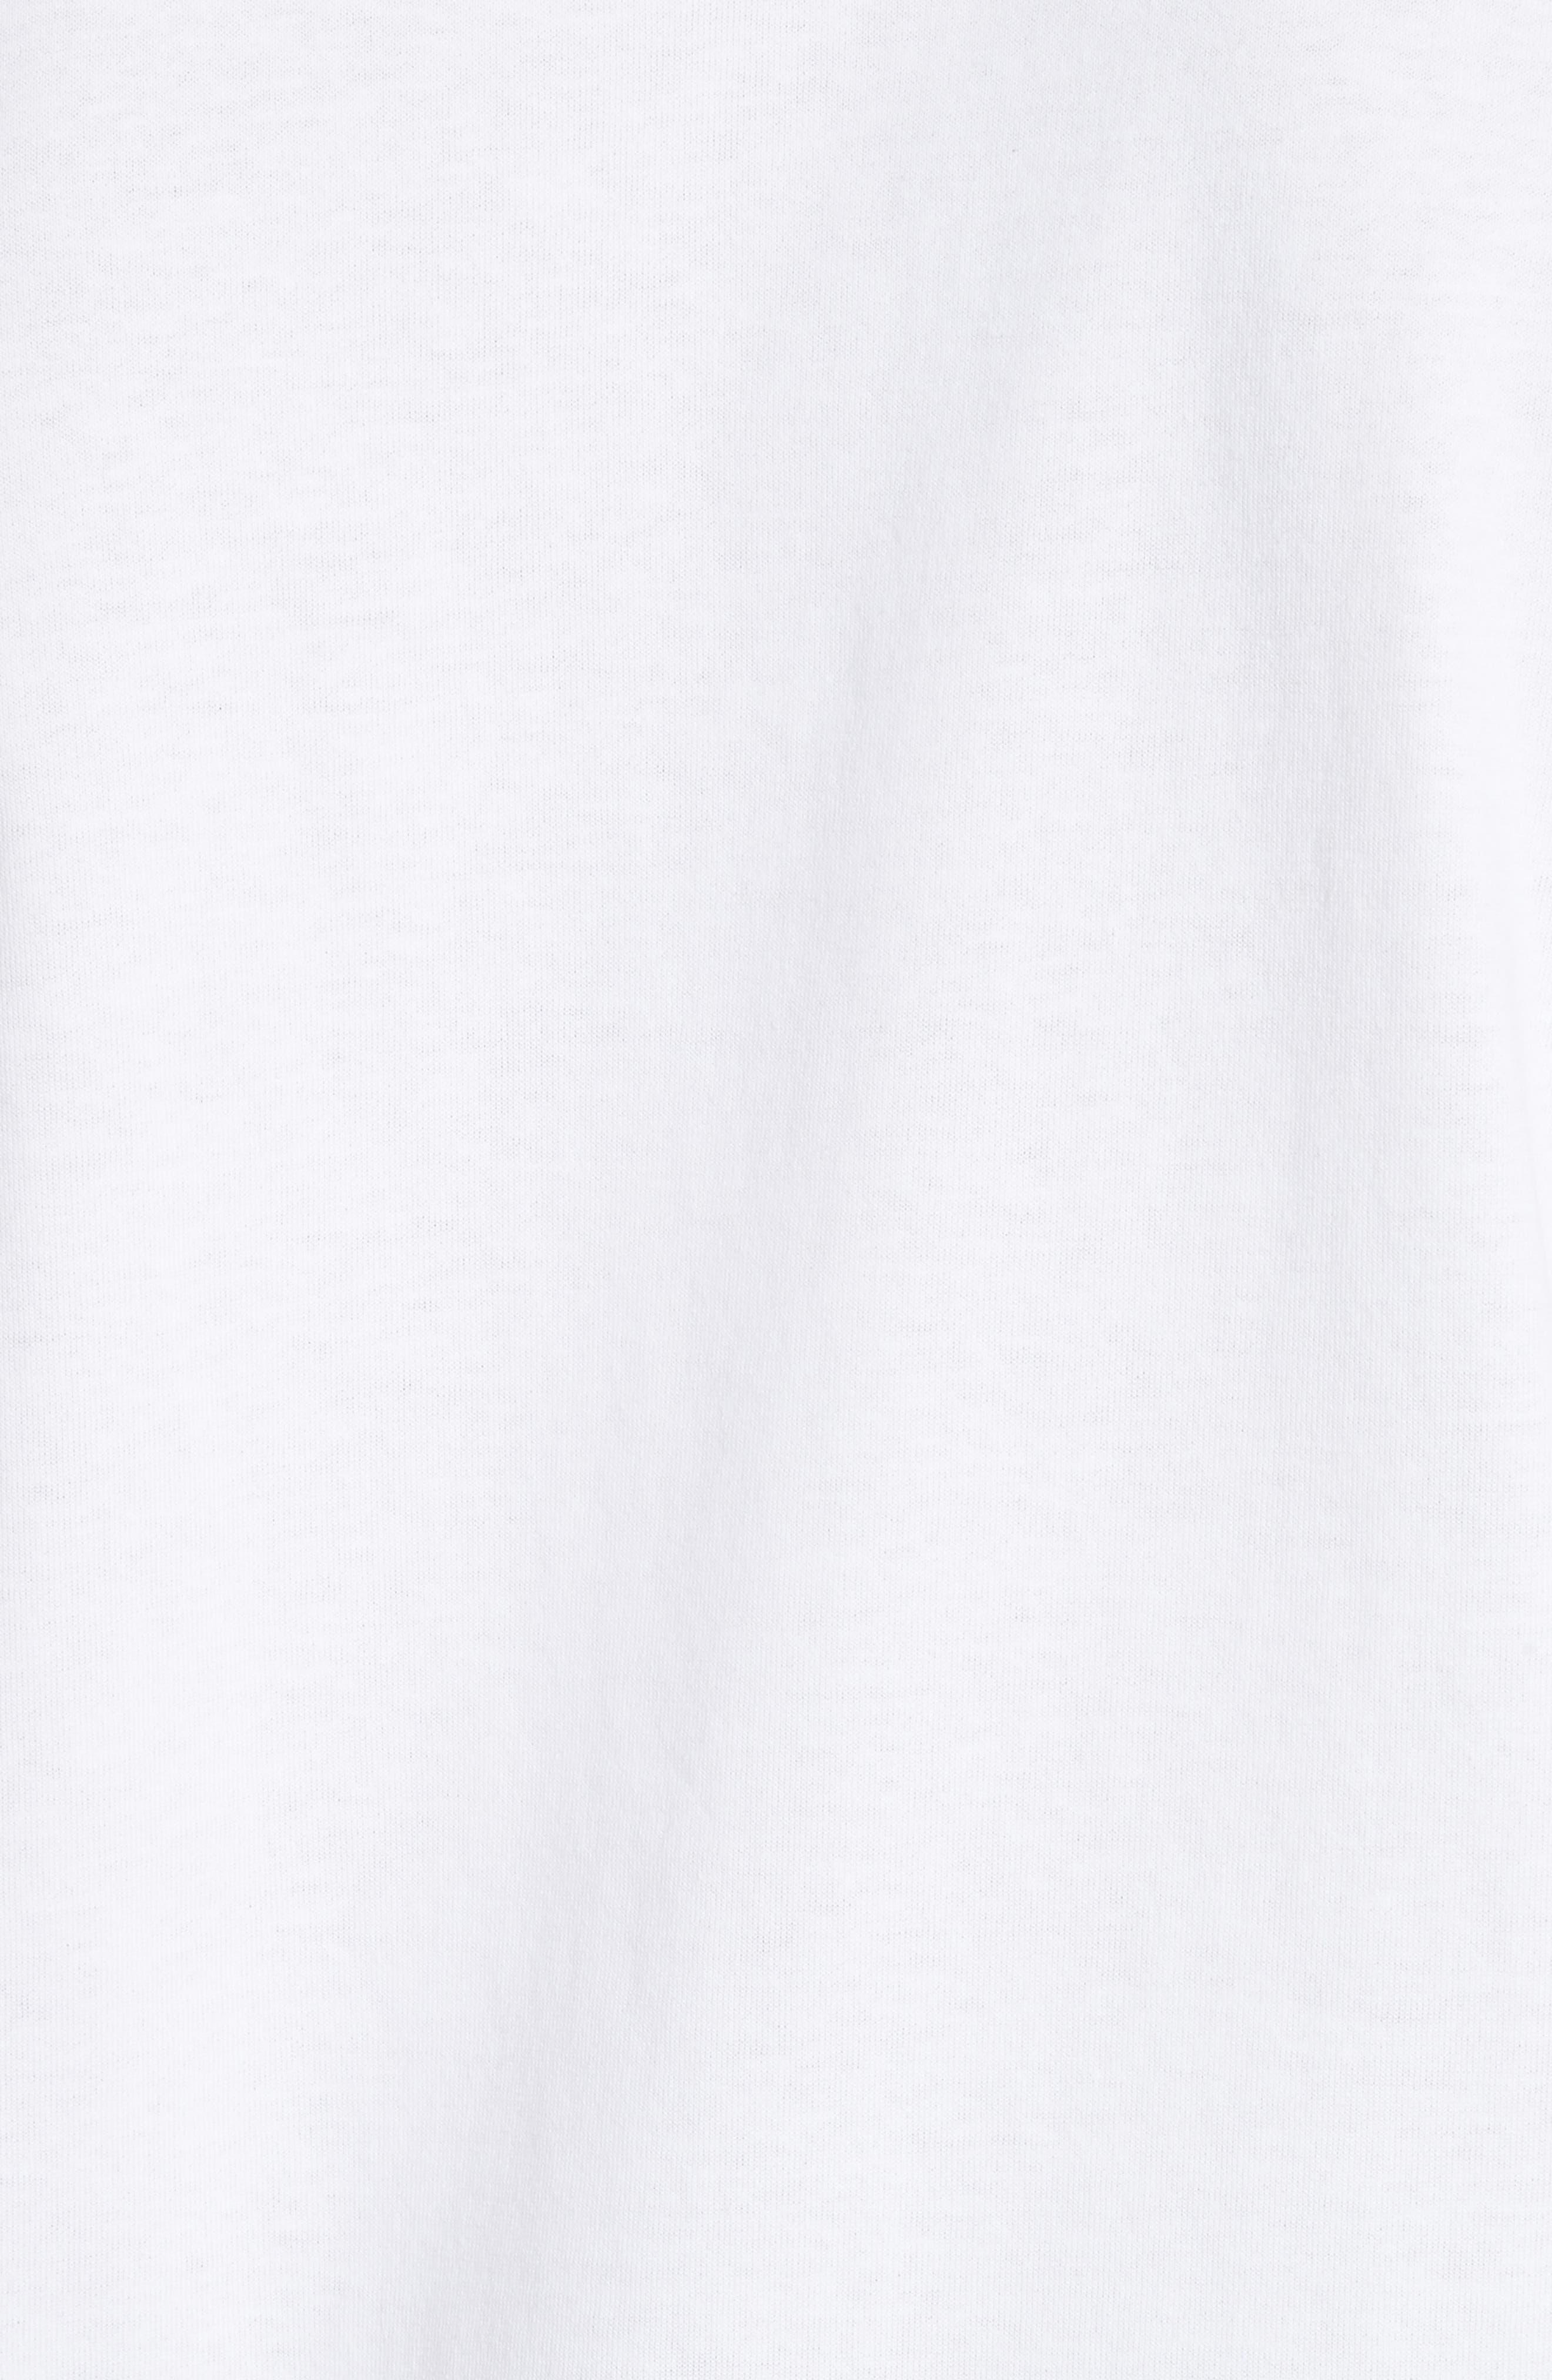 Tropicool Graphic T-Shirt,                             Alternate thumbnail 5, color,                             100